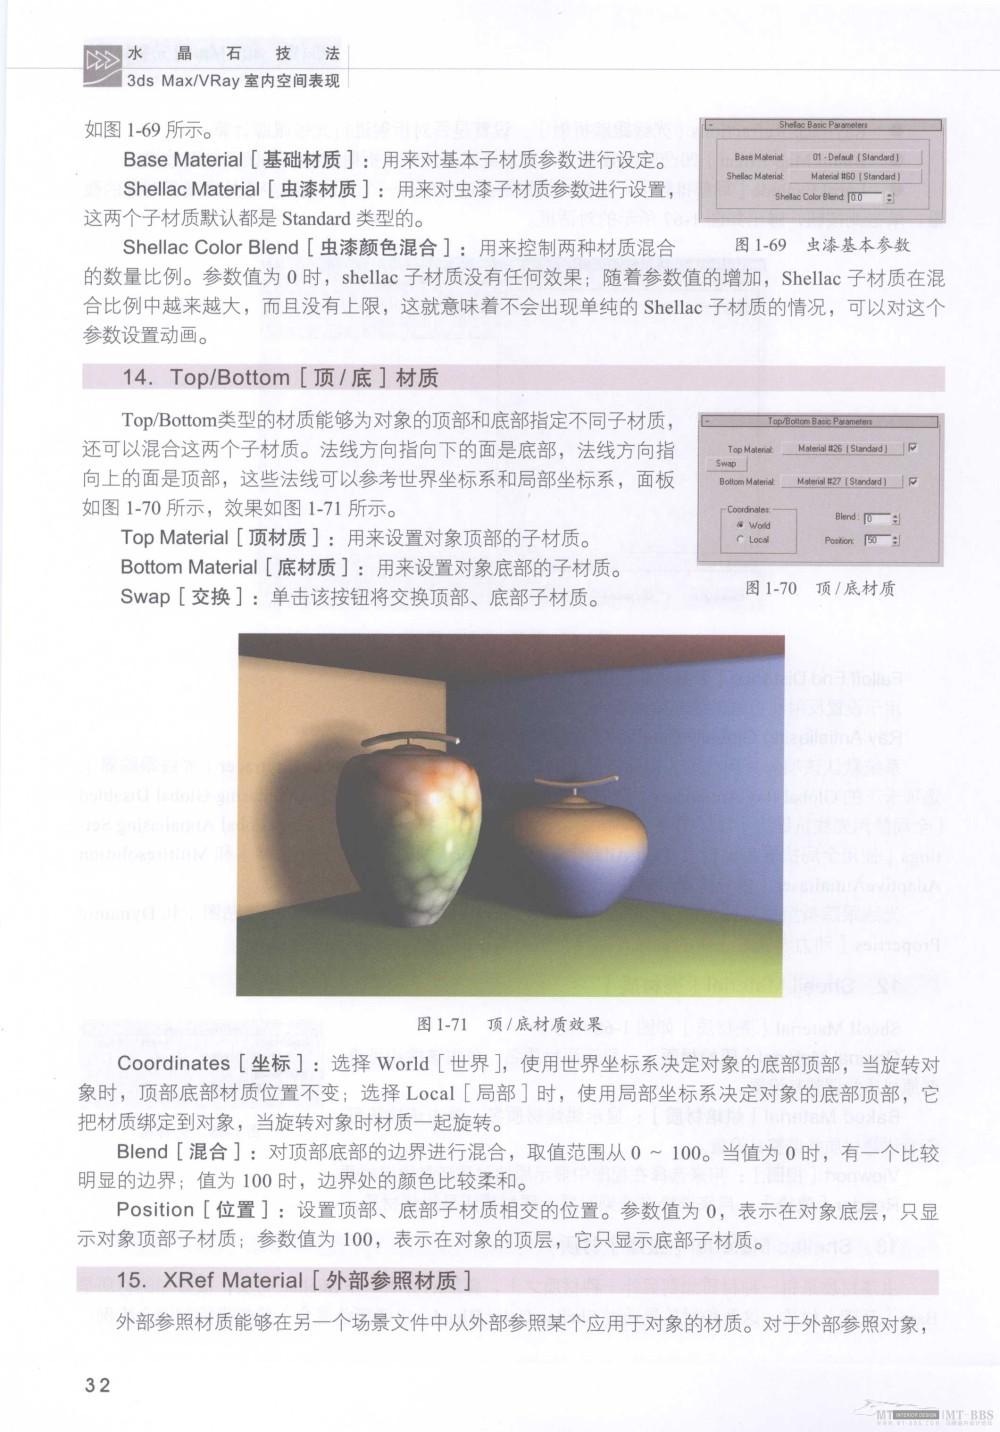 水晶石技法-3ds_Max&VRay室内空间表现_水晶石技法-3ds_Max&VRay室内空间表现_页面_038.jpg